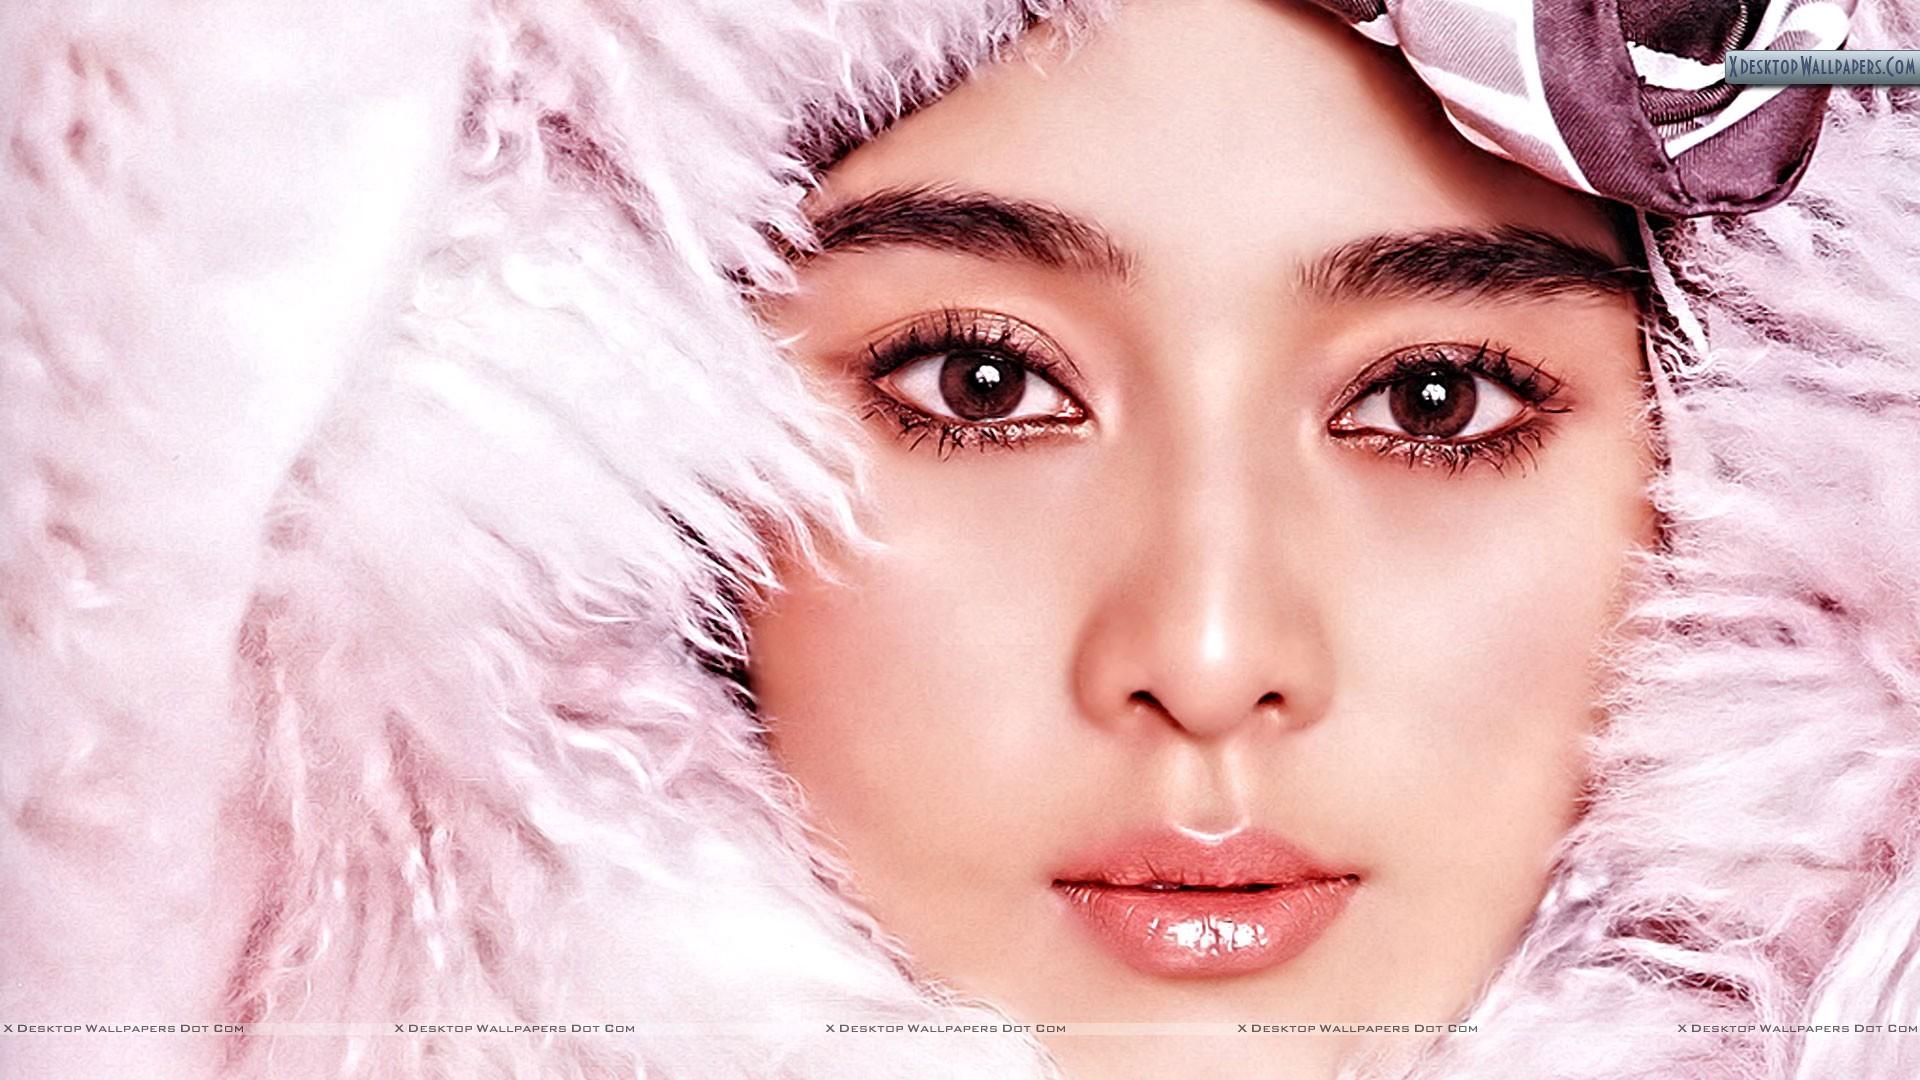 Fur Coats for Women   Japanese Girl In Pink Fur Coat Wallpaper